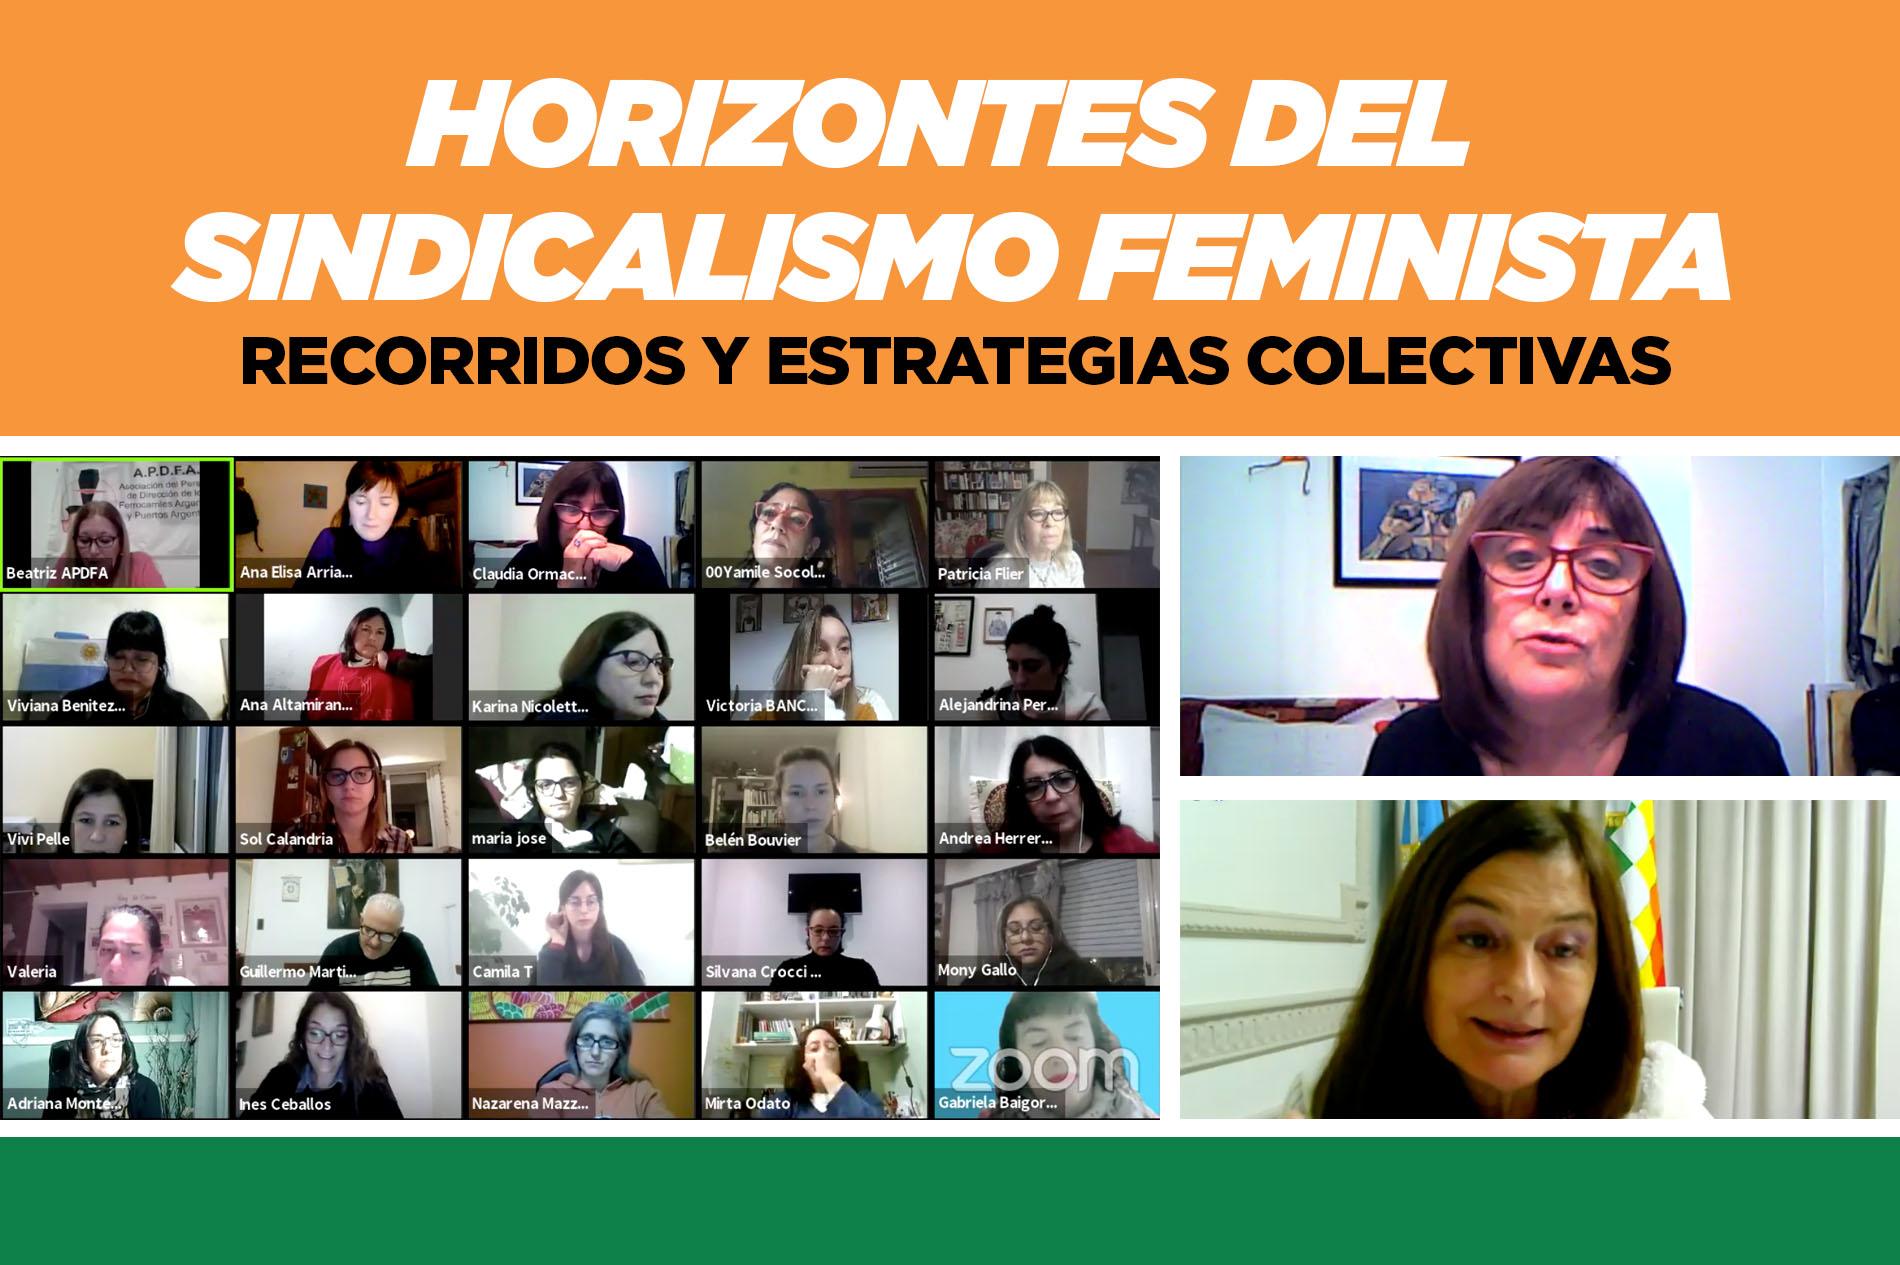 Horizontes del sindicalismo feminista. Recorridos y estrategias colectivas.